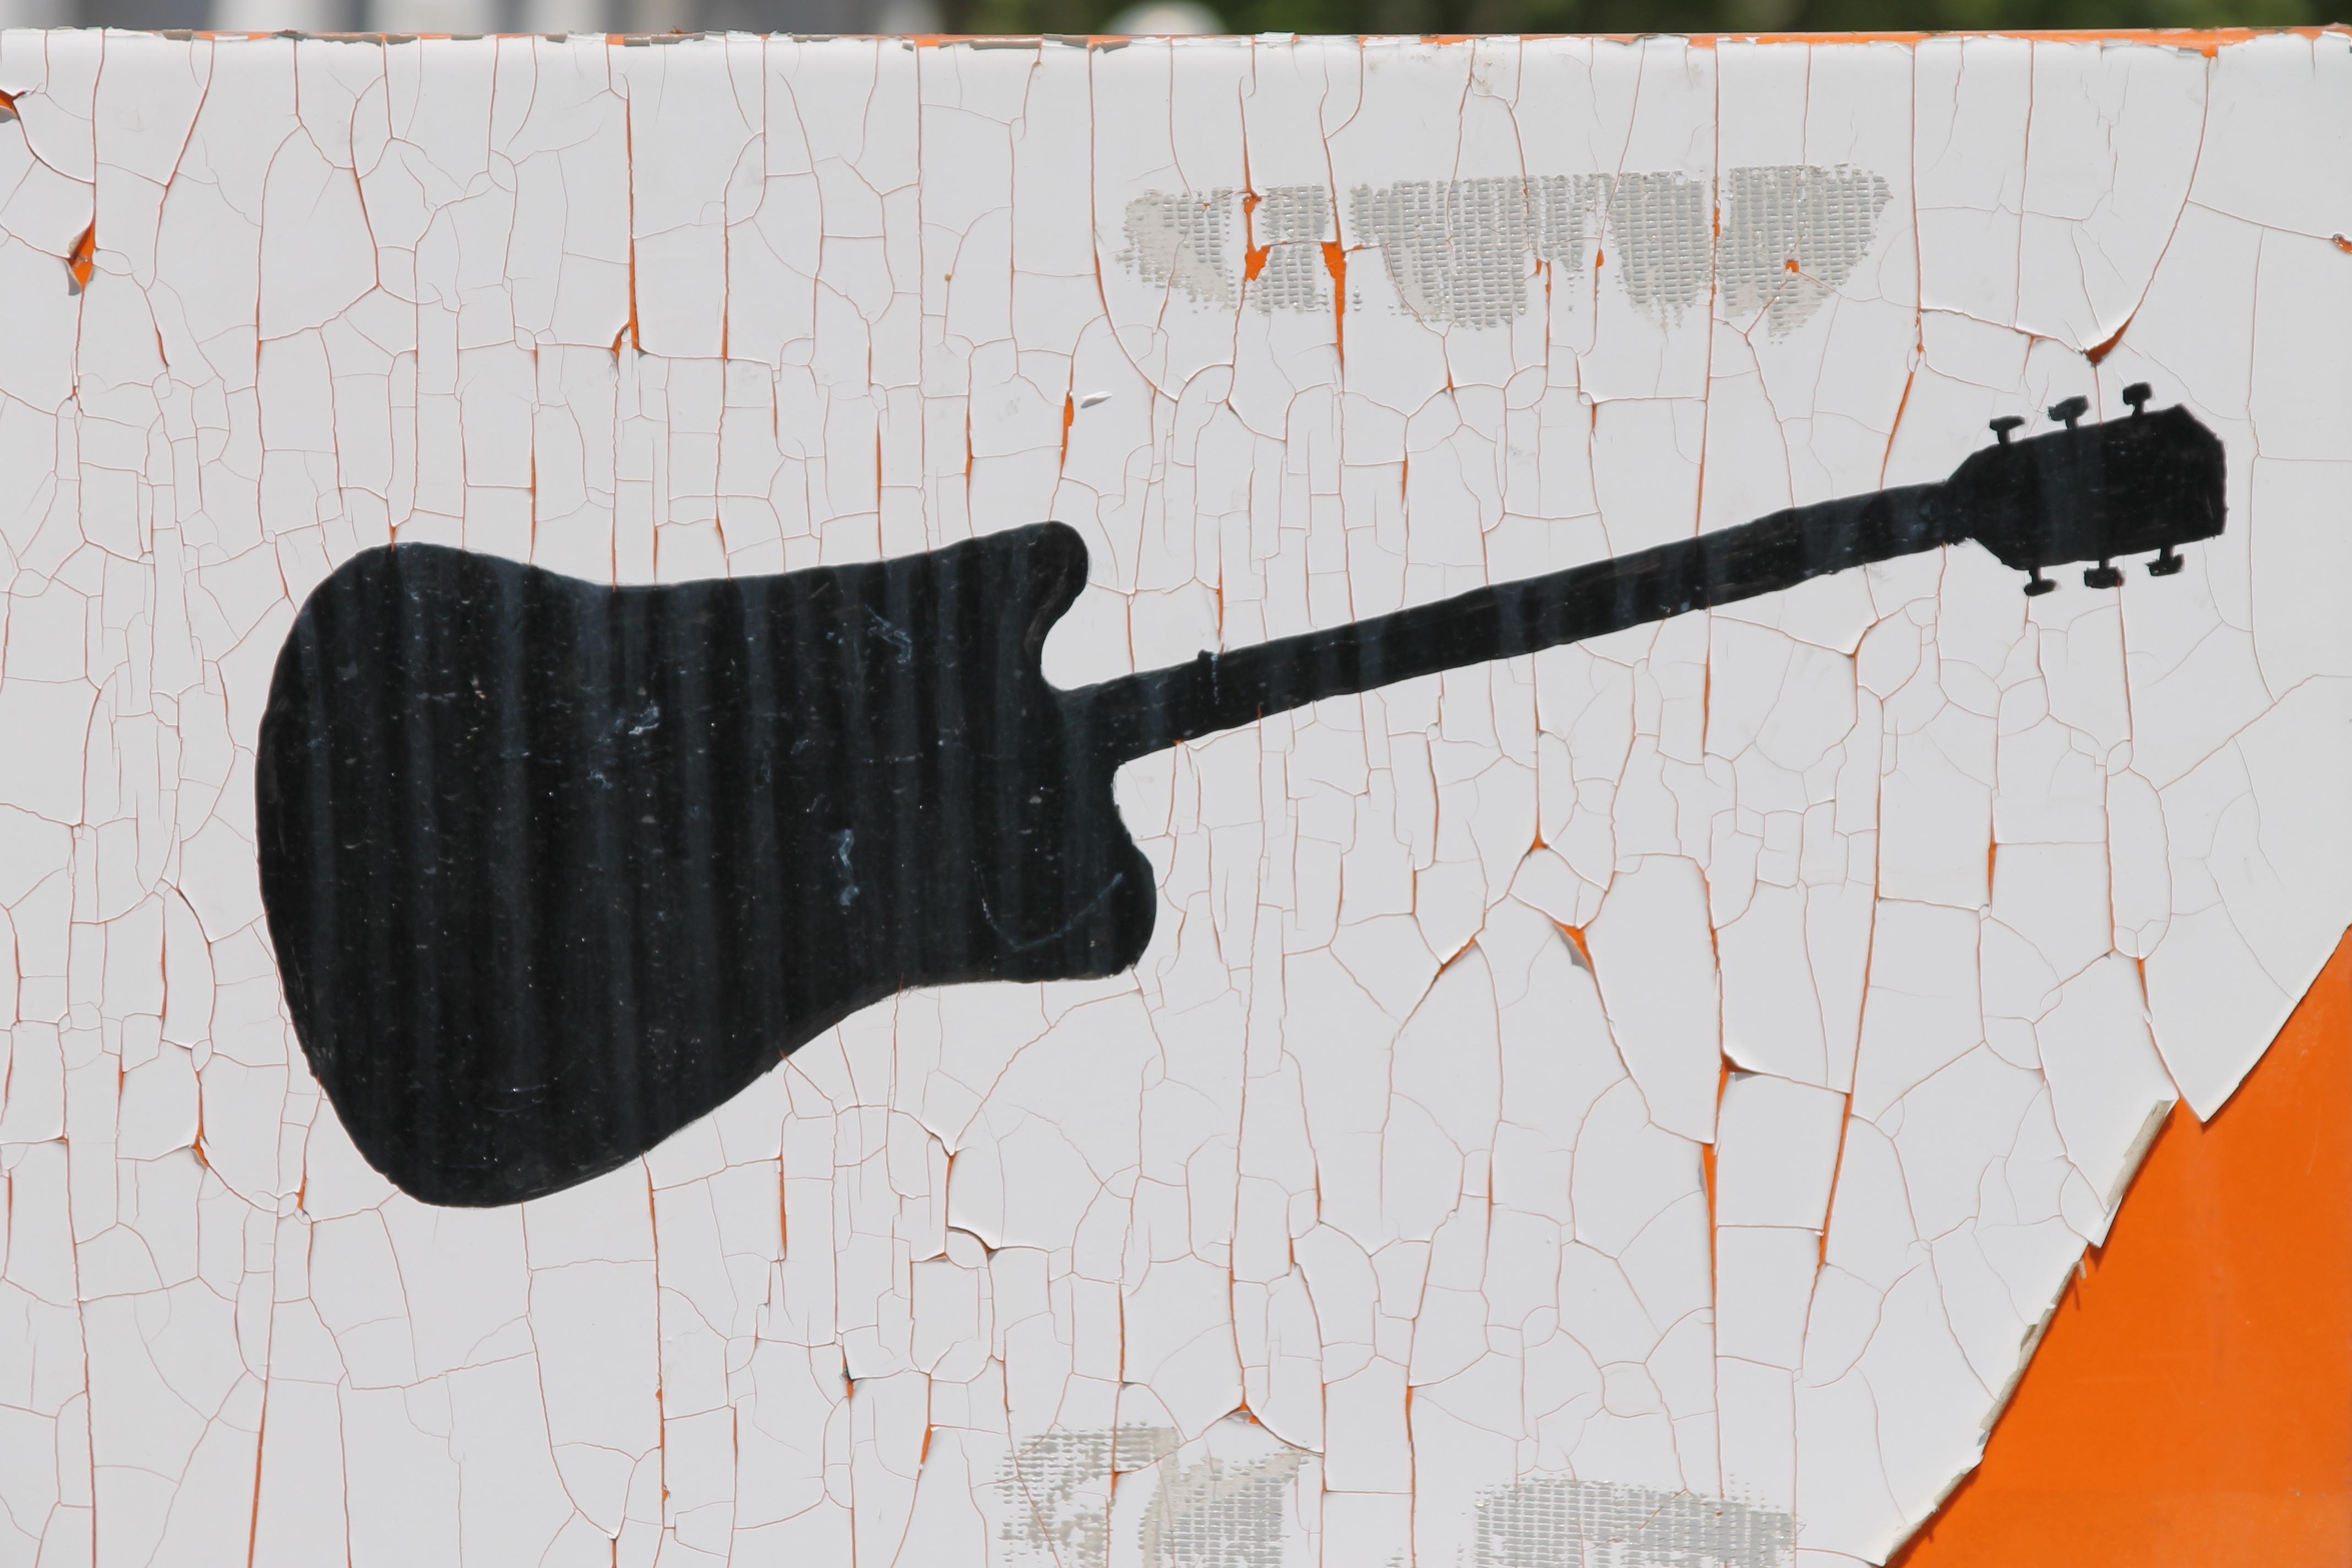 Gambar Gitar Dinding Seni Ilustrasi 4272x2848 1405744